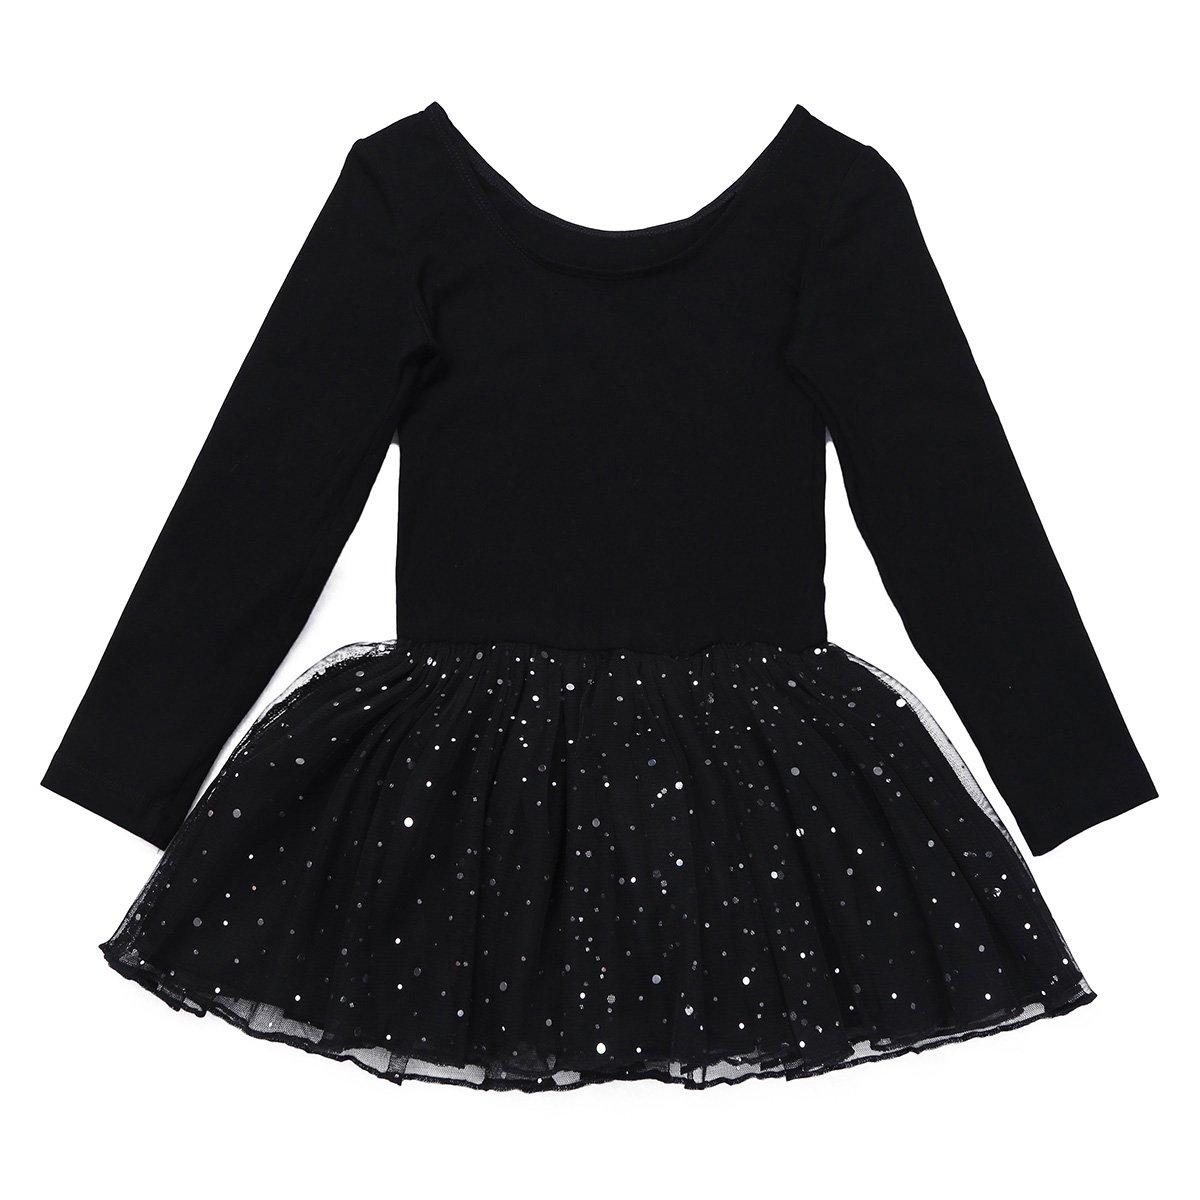 d25b3539fb0e Amazon.com  CHICTRY Girls Kids Classic Long Sleeve Party Leotard ...